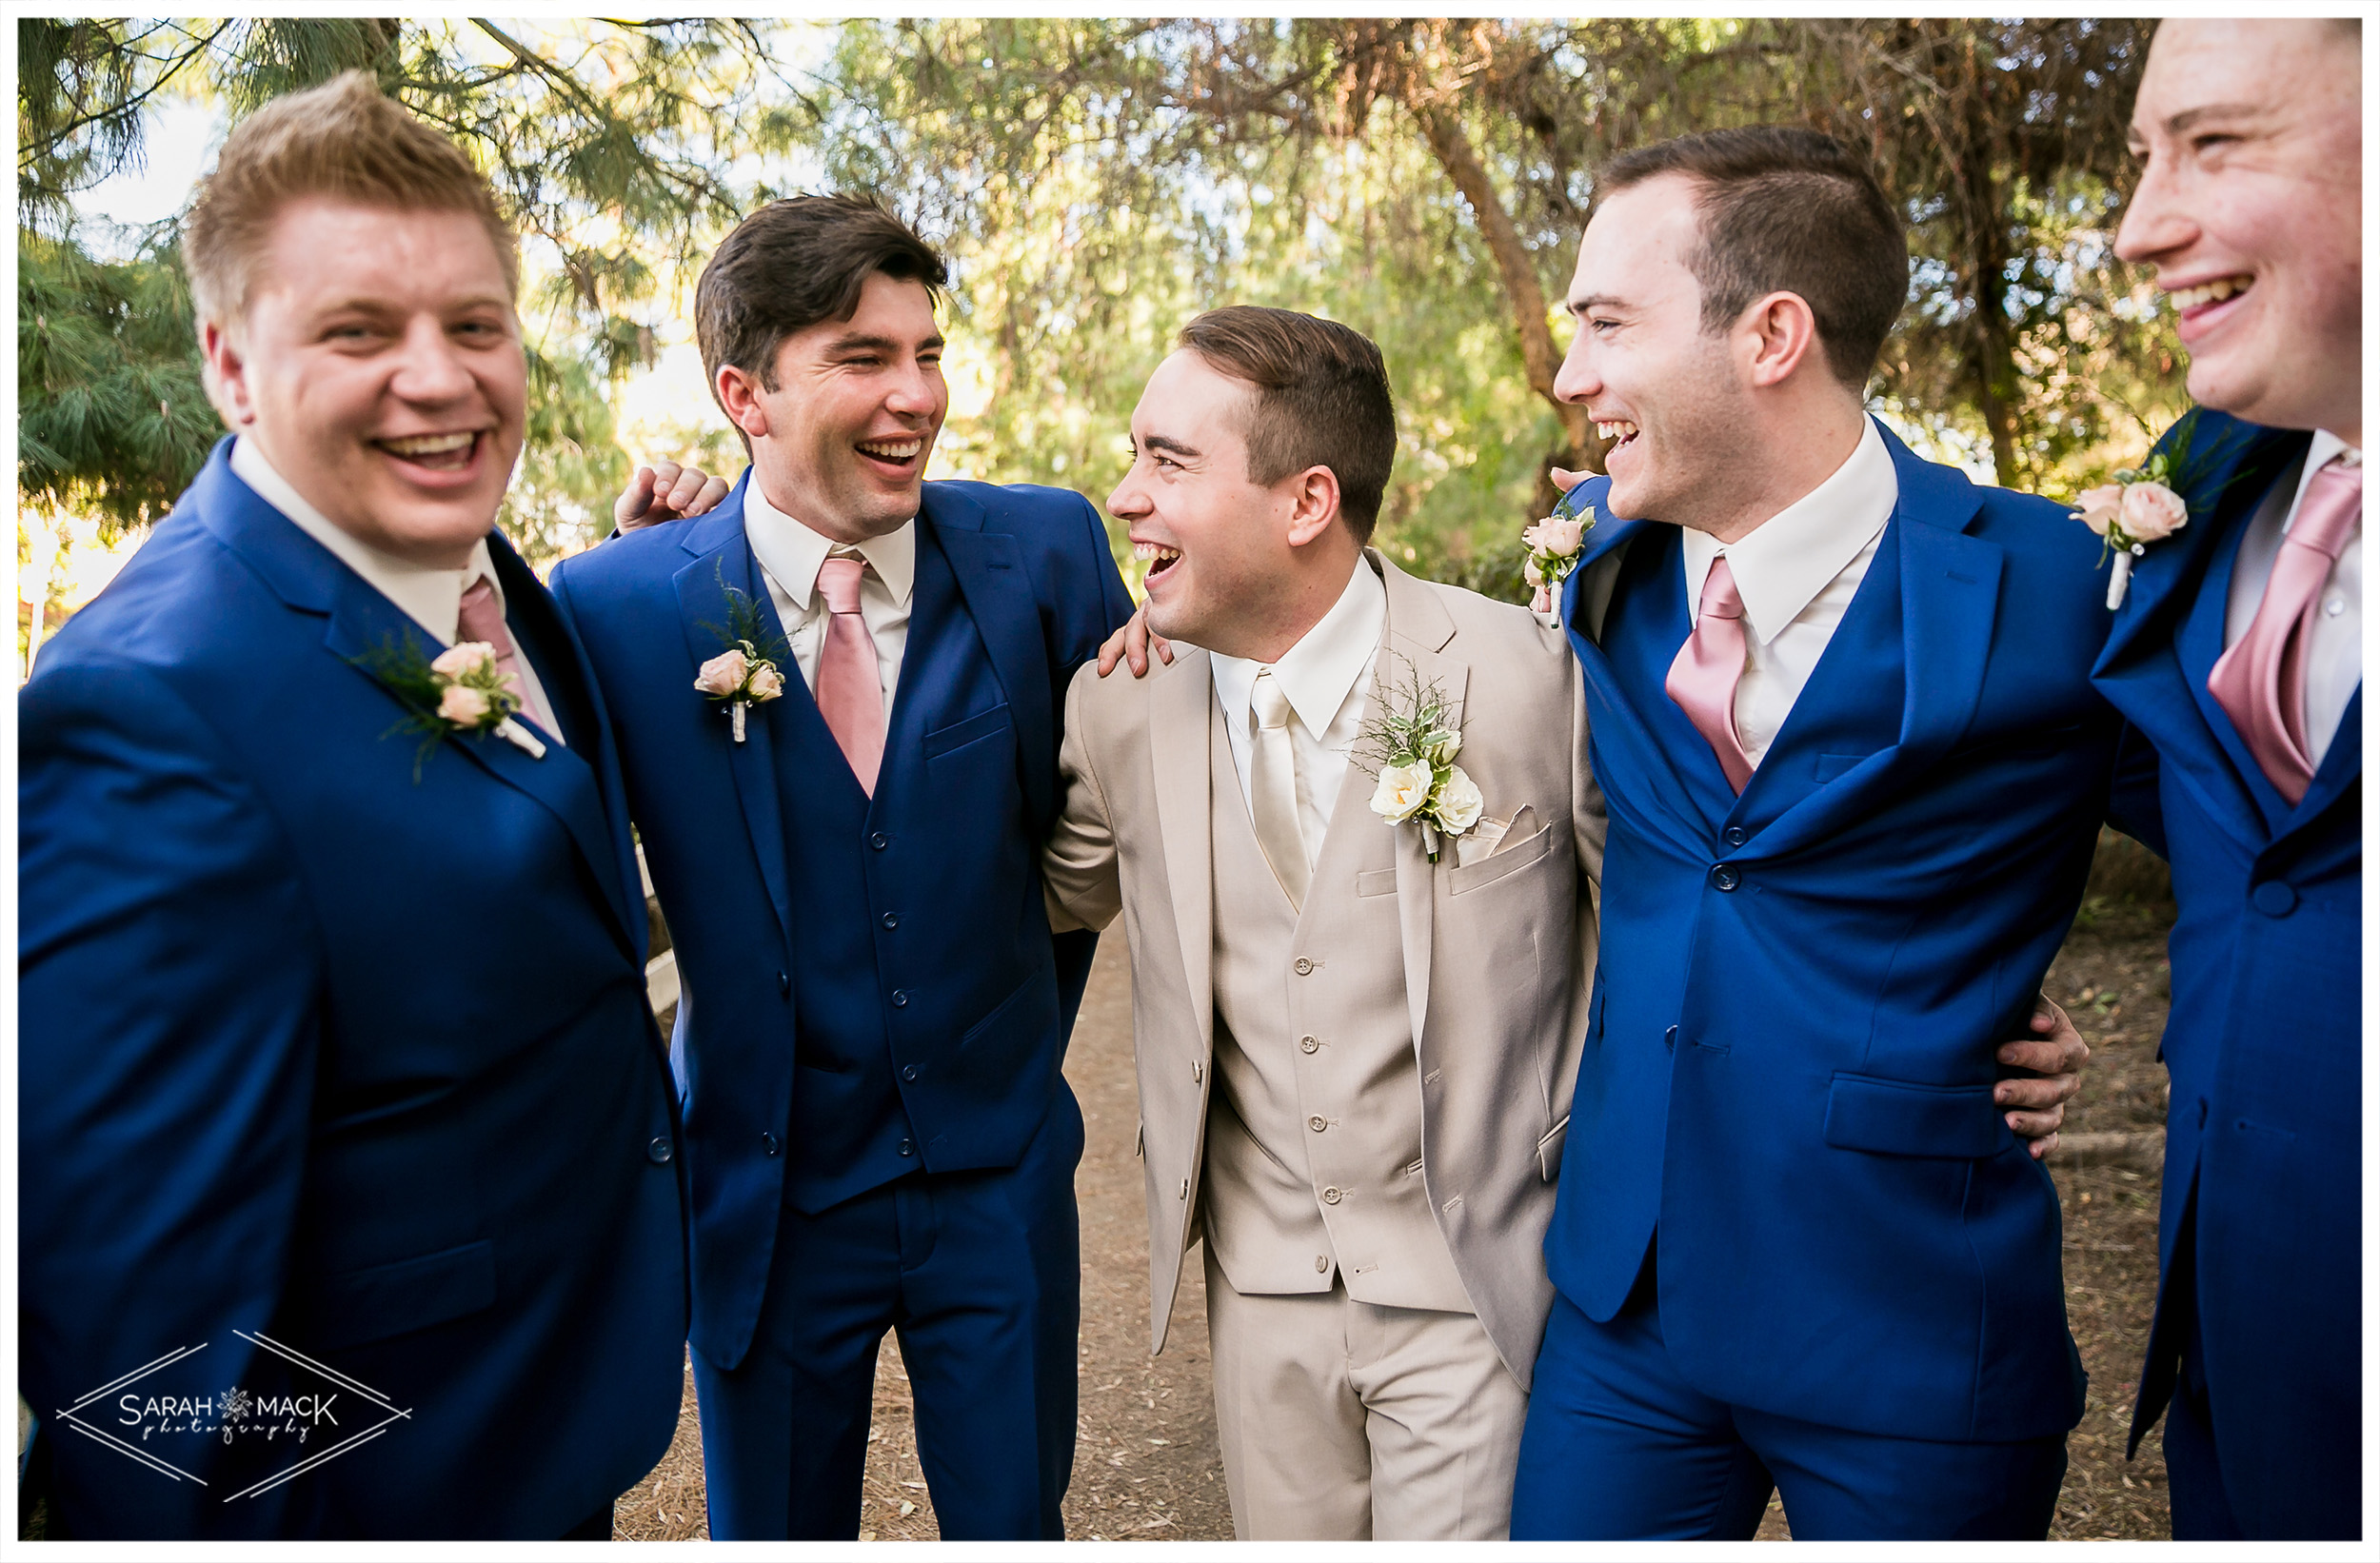 SA-Coyote-Hills-Golf-Course-Fullerton-Wedding-Photography-33.jpg